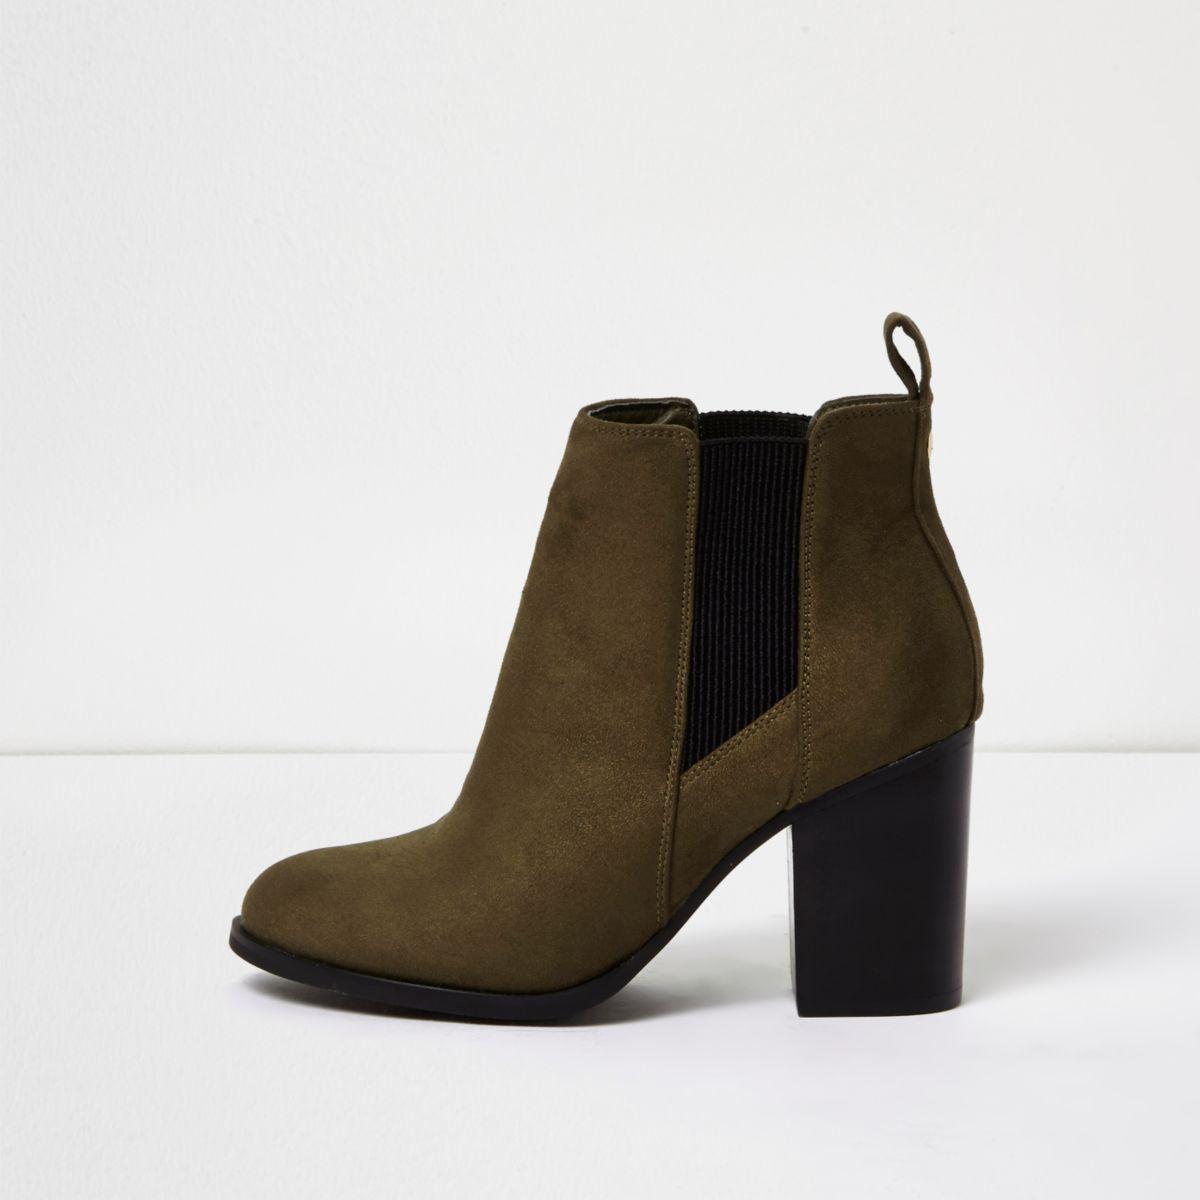 Khaki heeled Chelsea boots